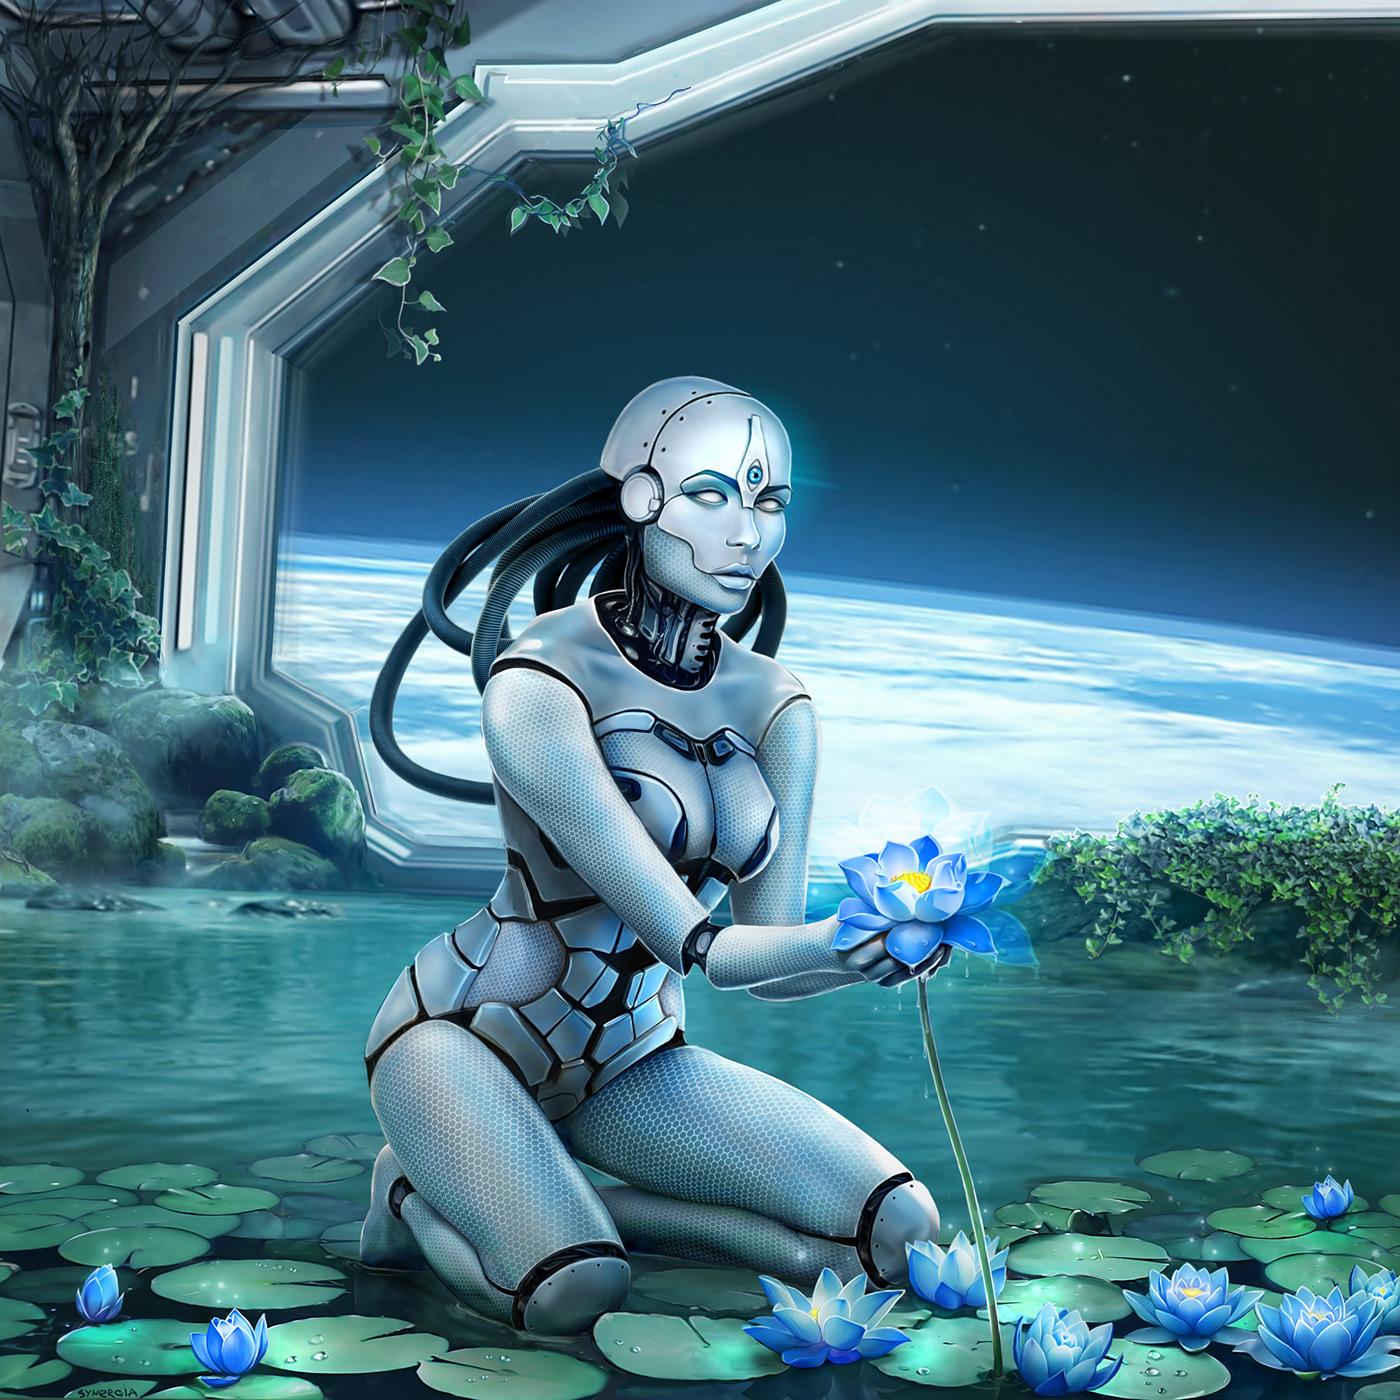 art cosmos cover digitalart fantasy FUTURISM Lotus sacred woman